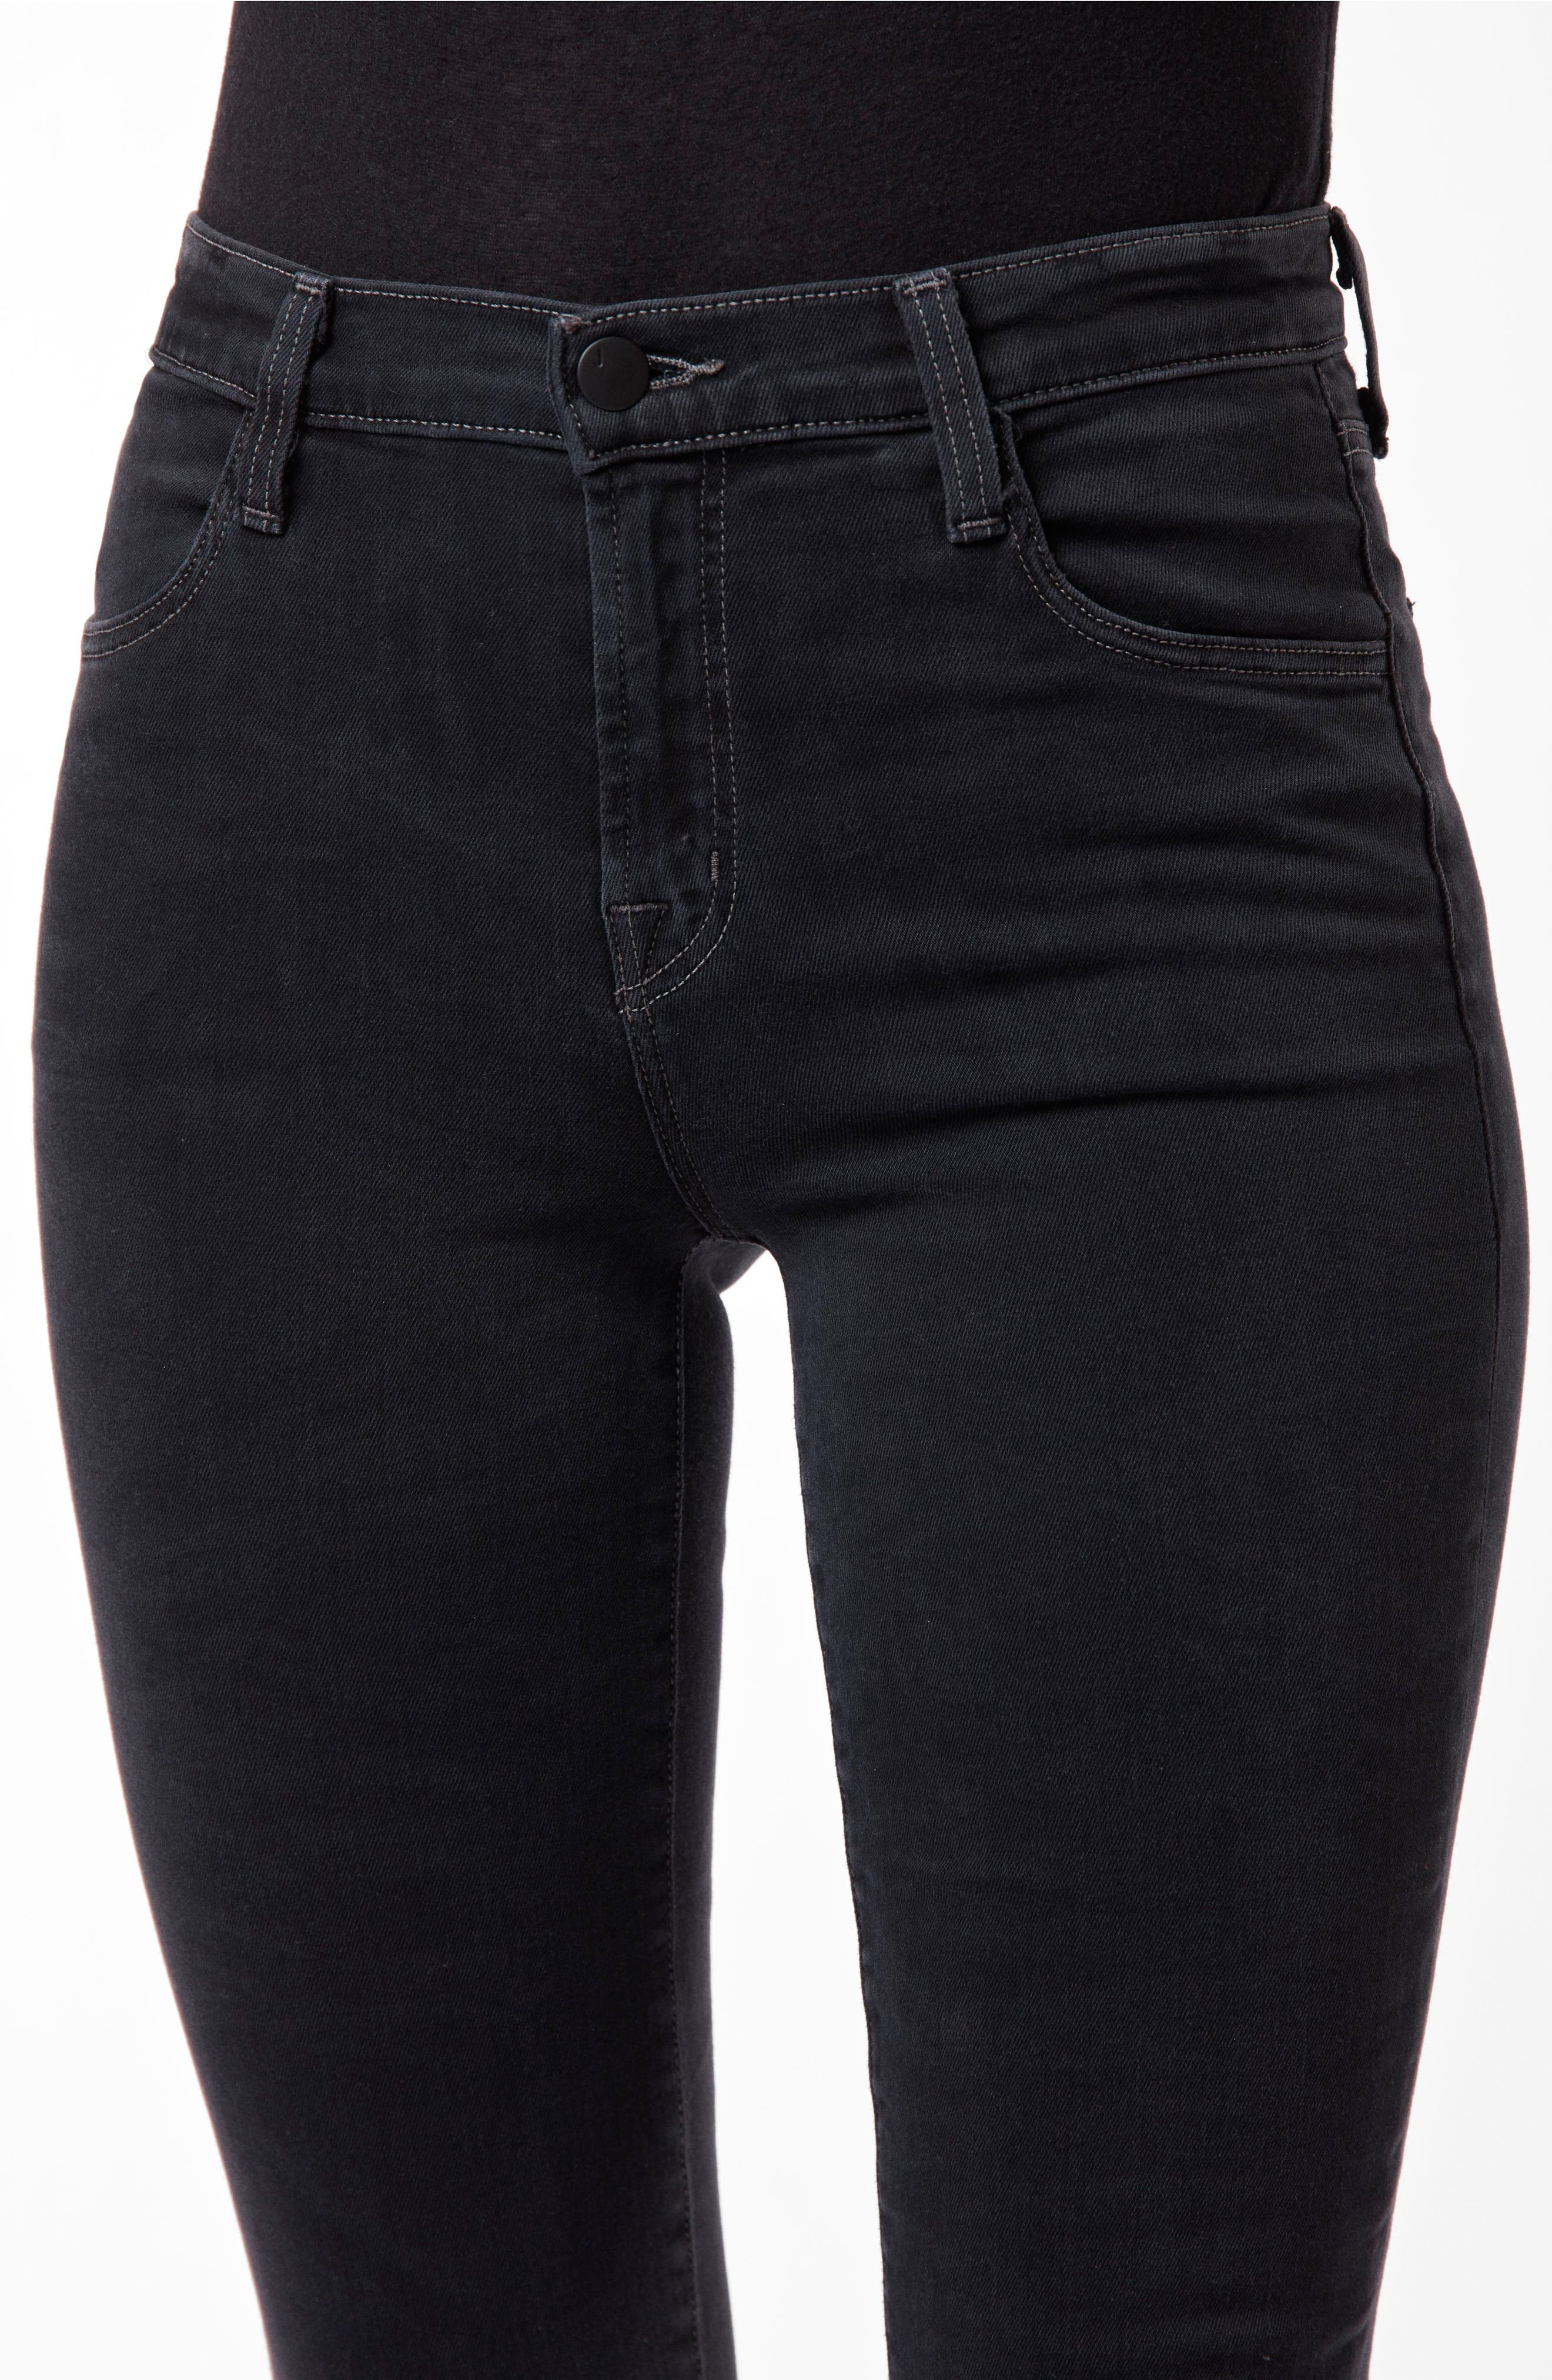 Maria High Waist Skinny Jeans,                             Alternate thumbnail 5, color,                             002